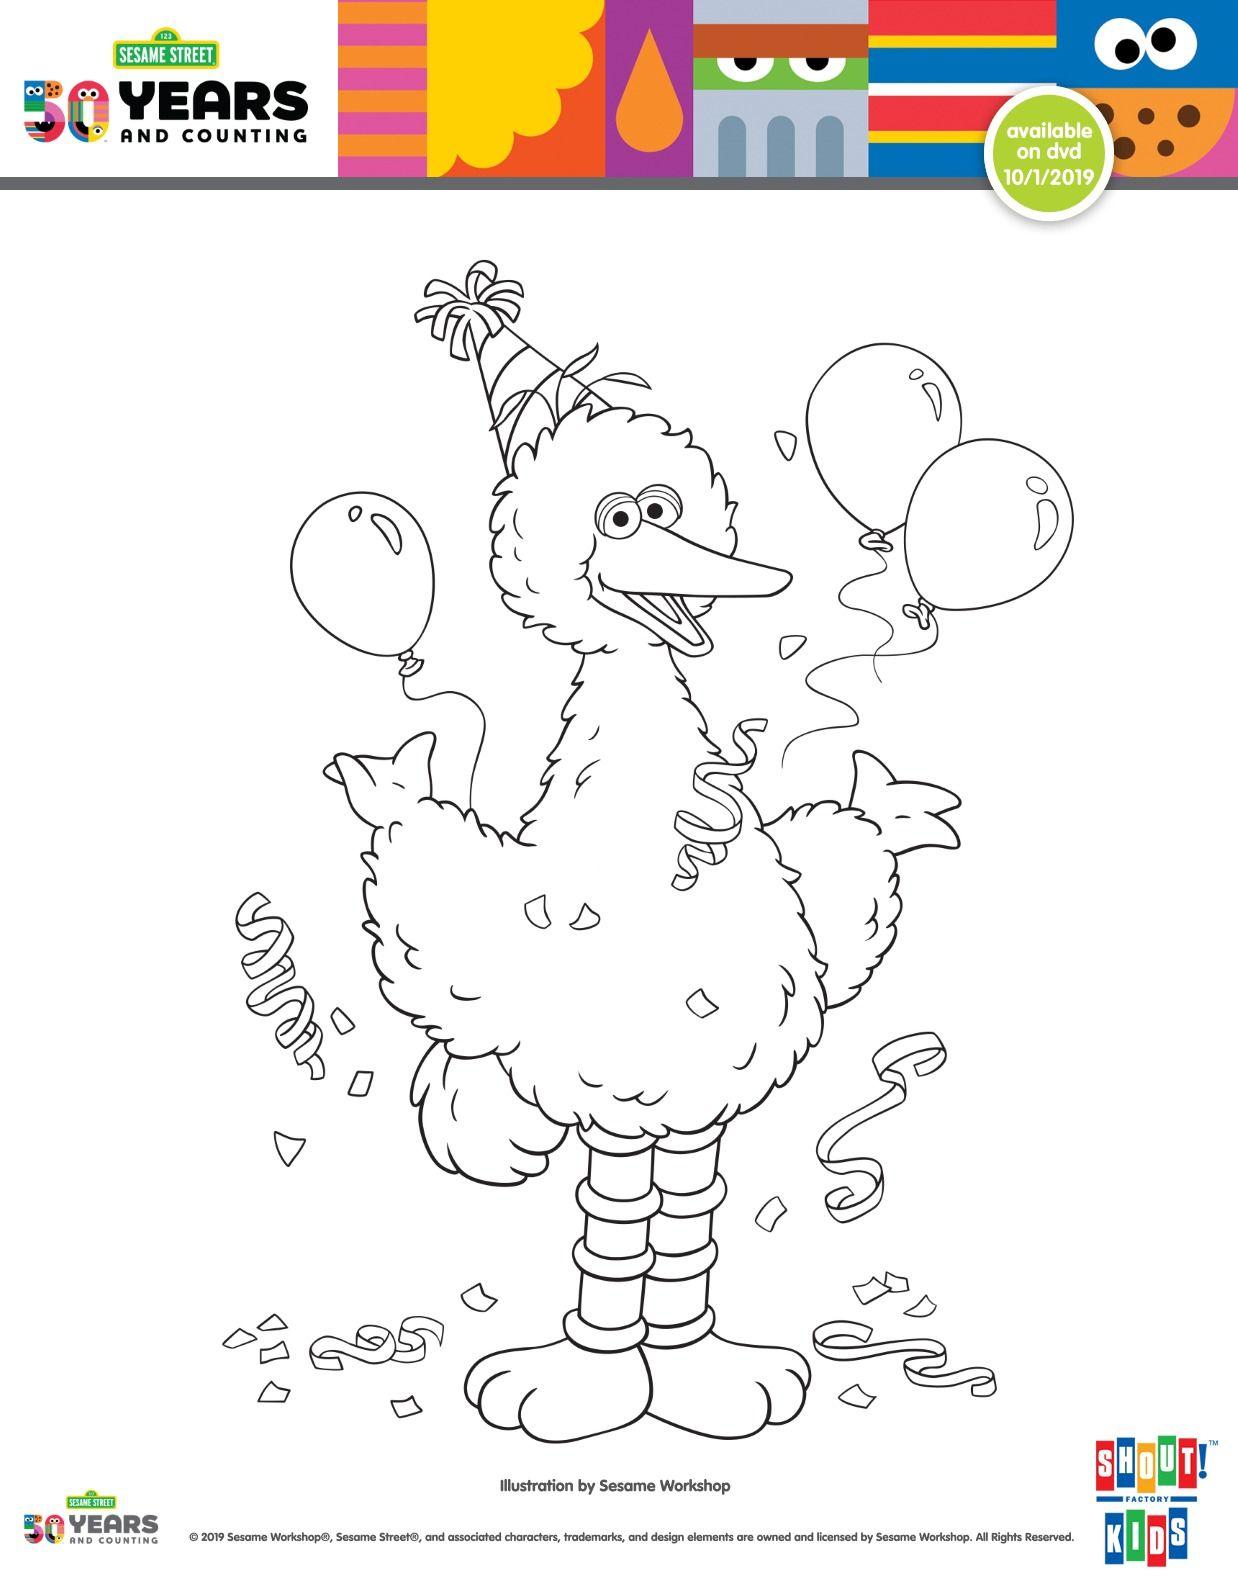 Free Printable Big Bird Birthday Coloring Page From Sesame Street Sesamestreet Bigbird Fr Birthday Coloring Pages Sesame Street Coloring Pages Bird Birthday